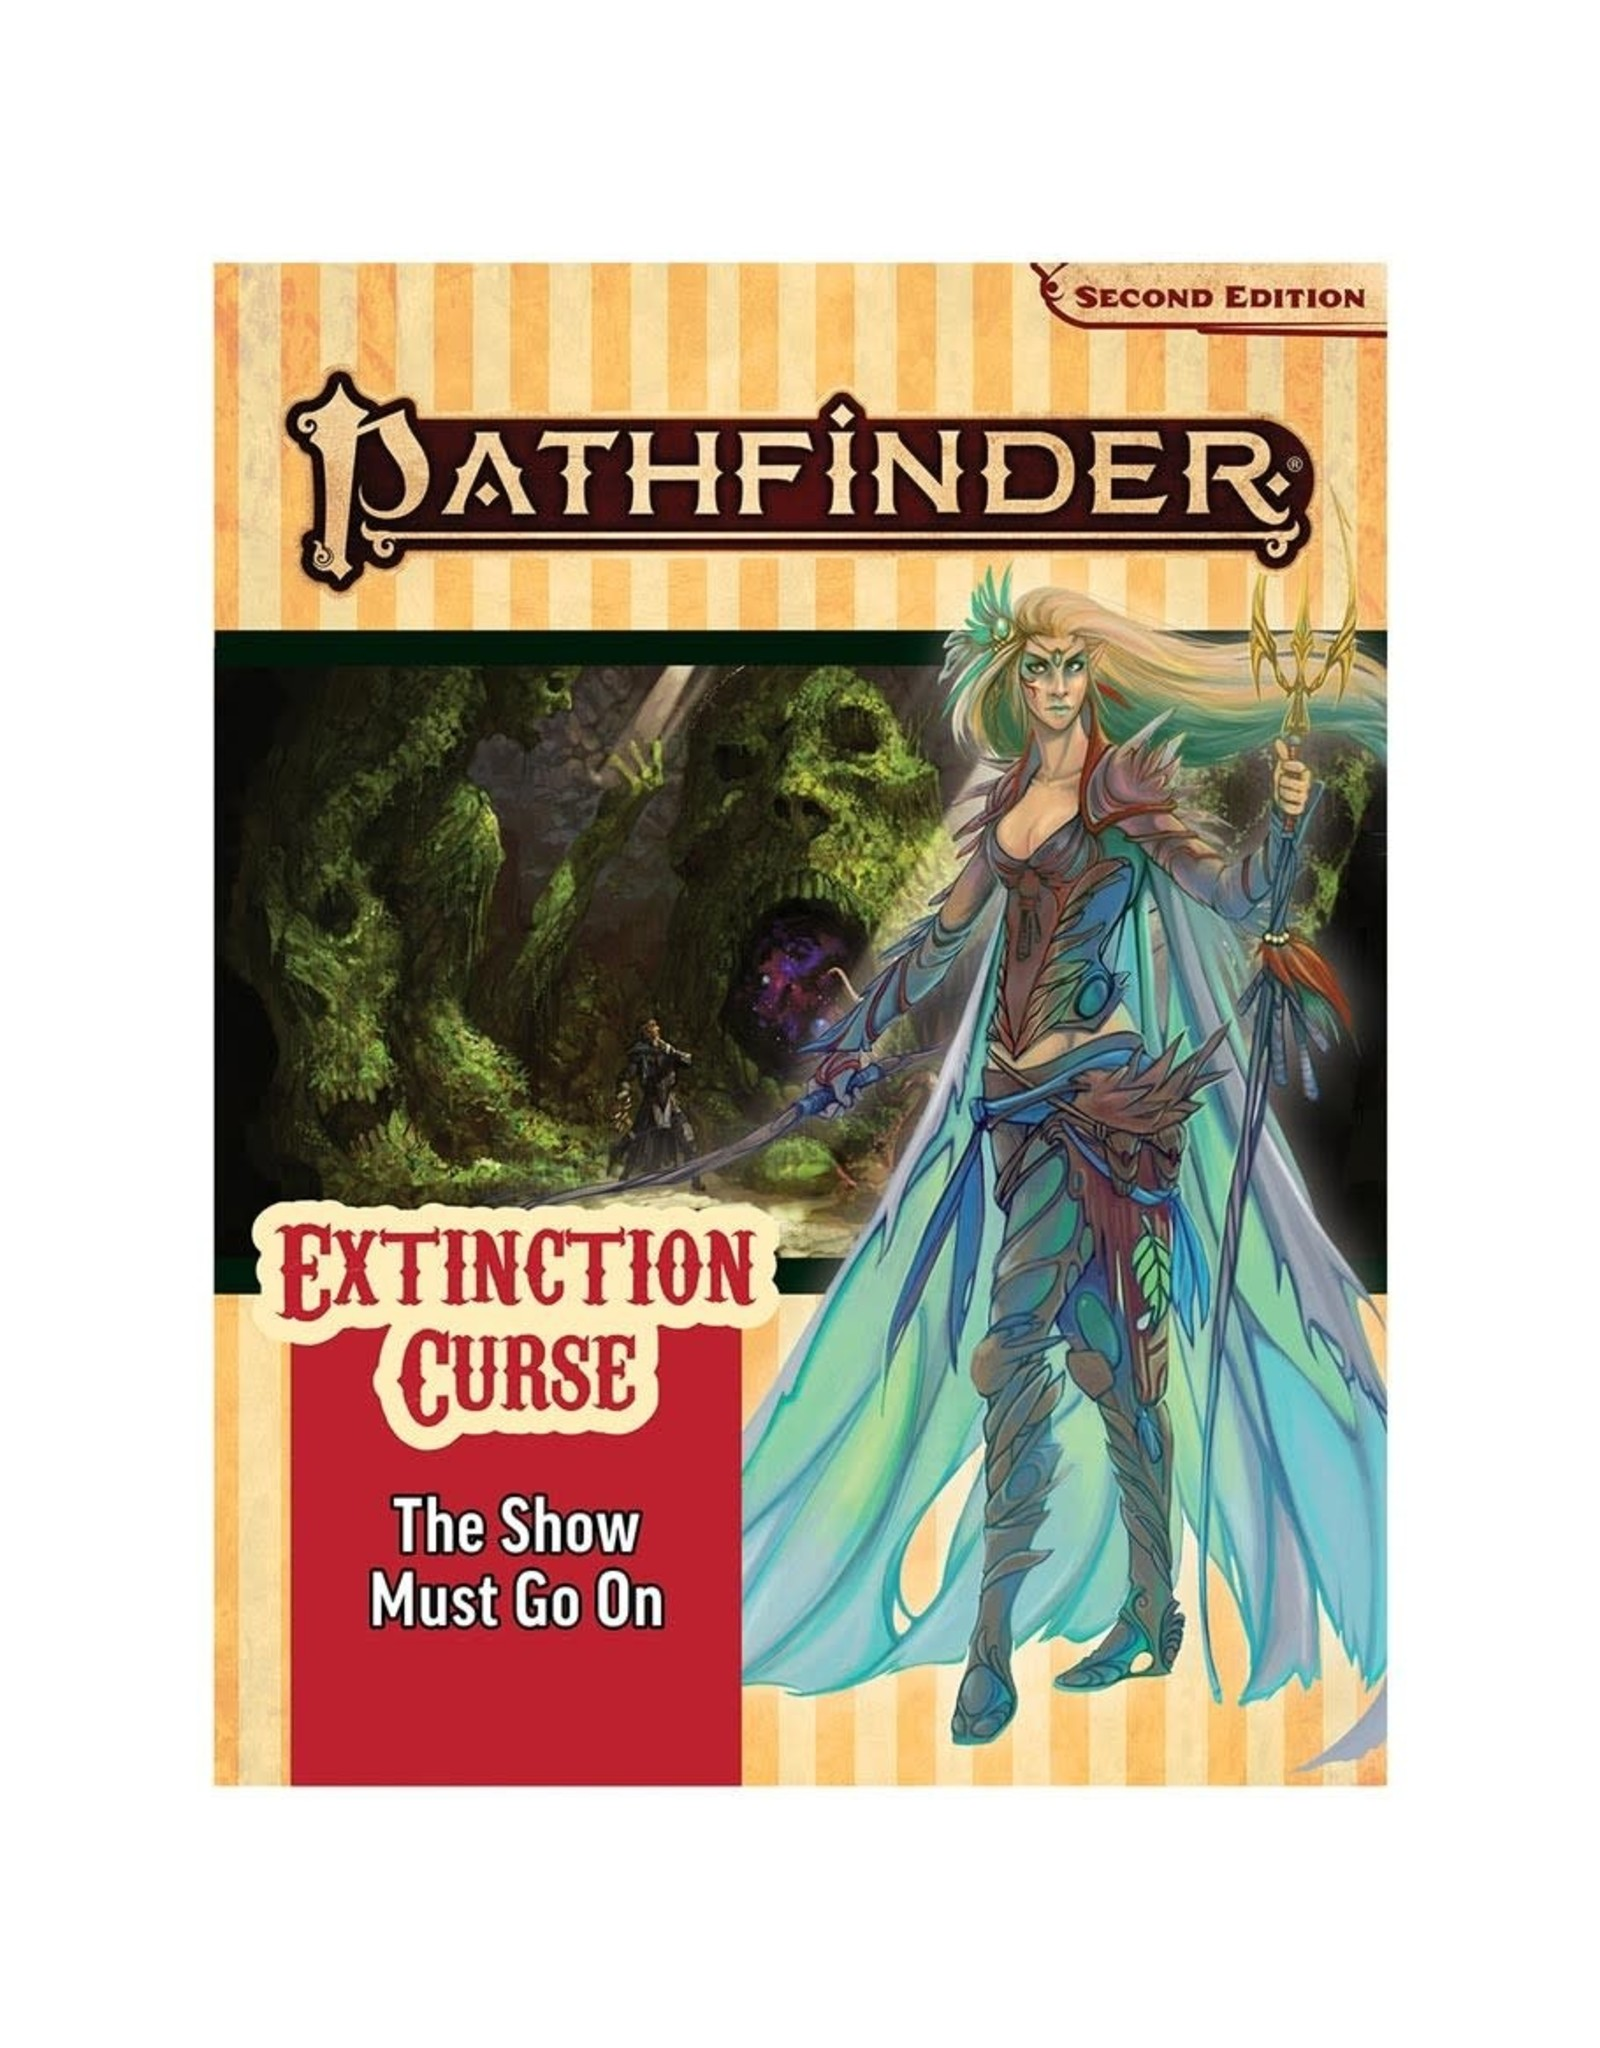 Paizo Pathfinder 2E Adventure Path: Extinction Curse 1 - The Show Must Go On